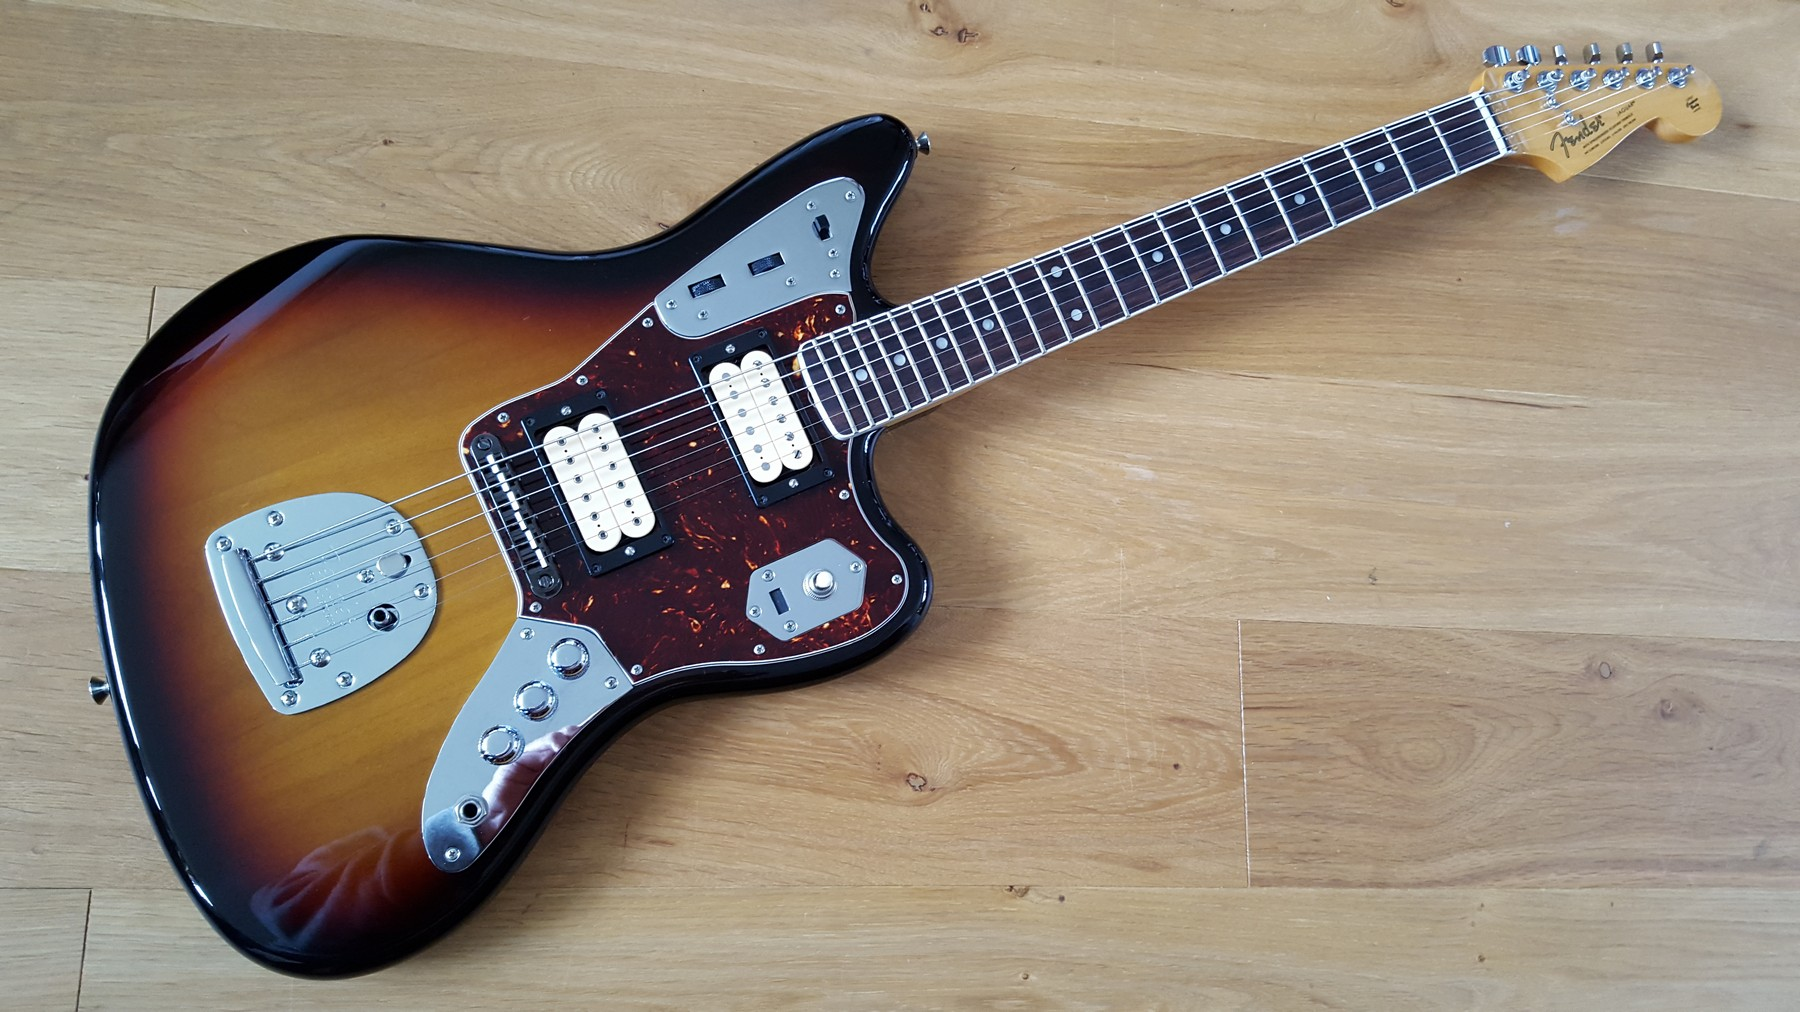 Fender Stratocaster Neck >> SOLD: Fender Jaguar Kurt Cobain NOS sunburst - Classic ...